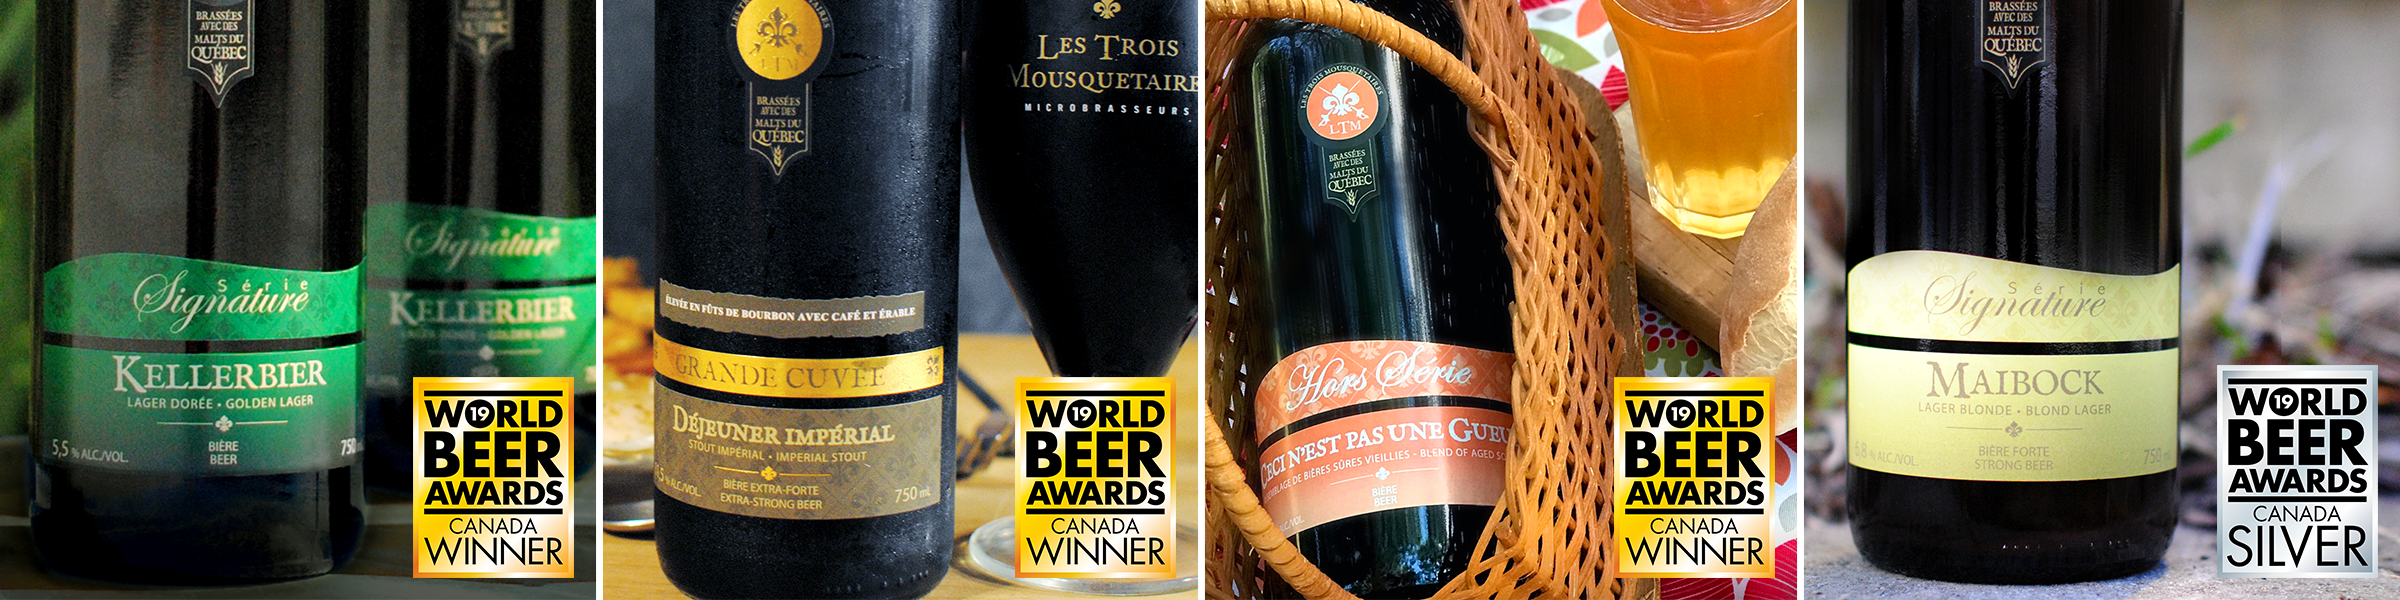 Nos bières médaillées au World Beer Award!